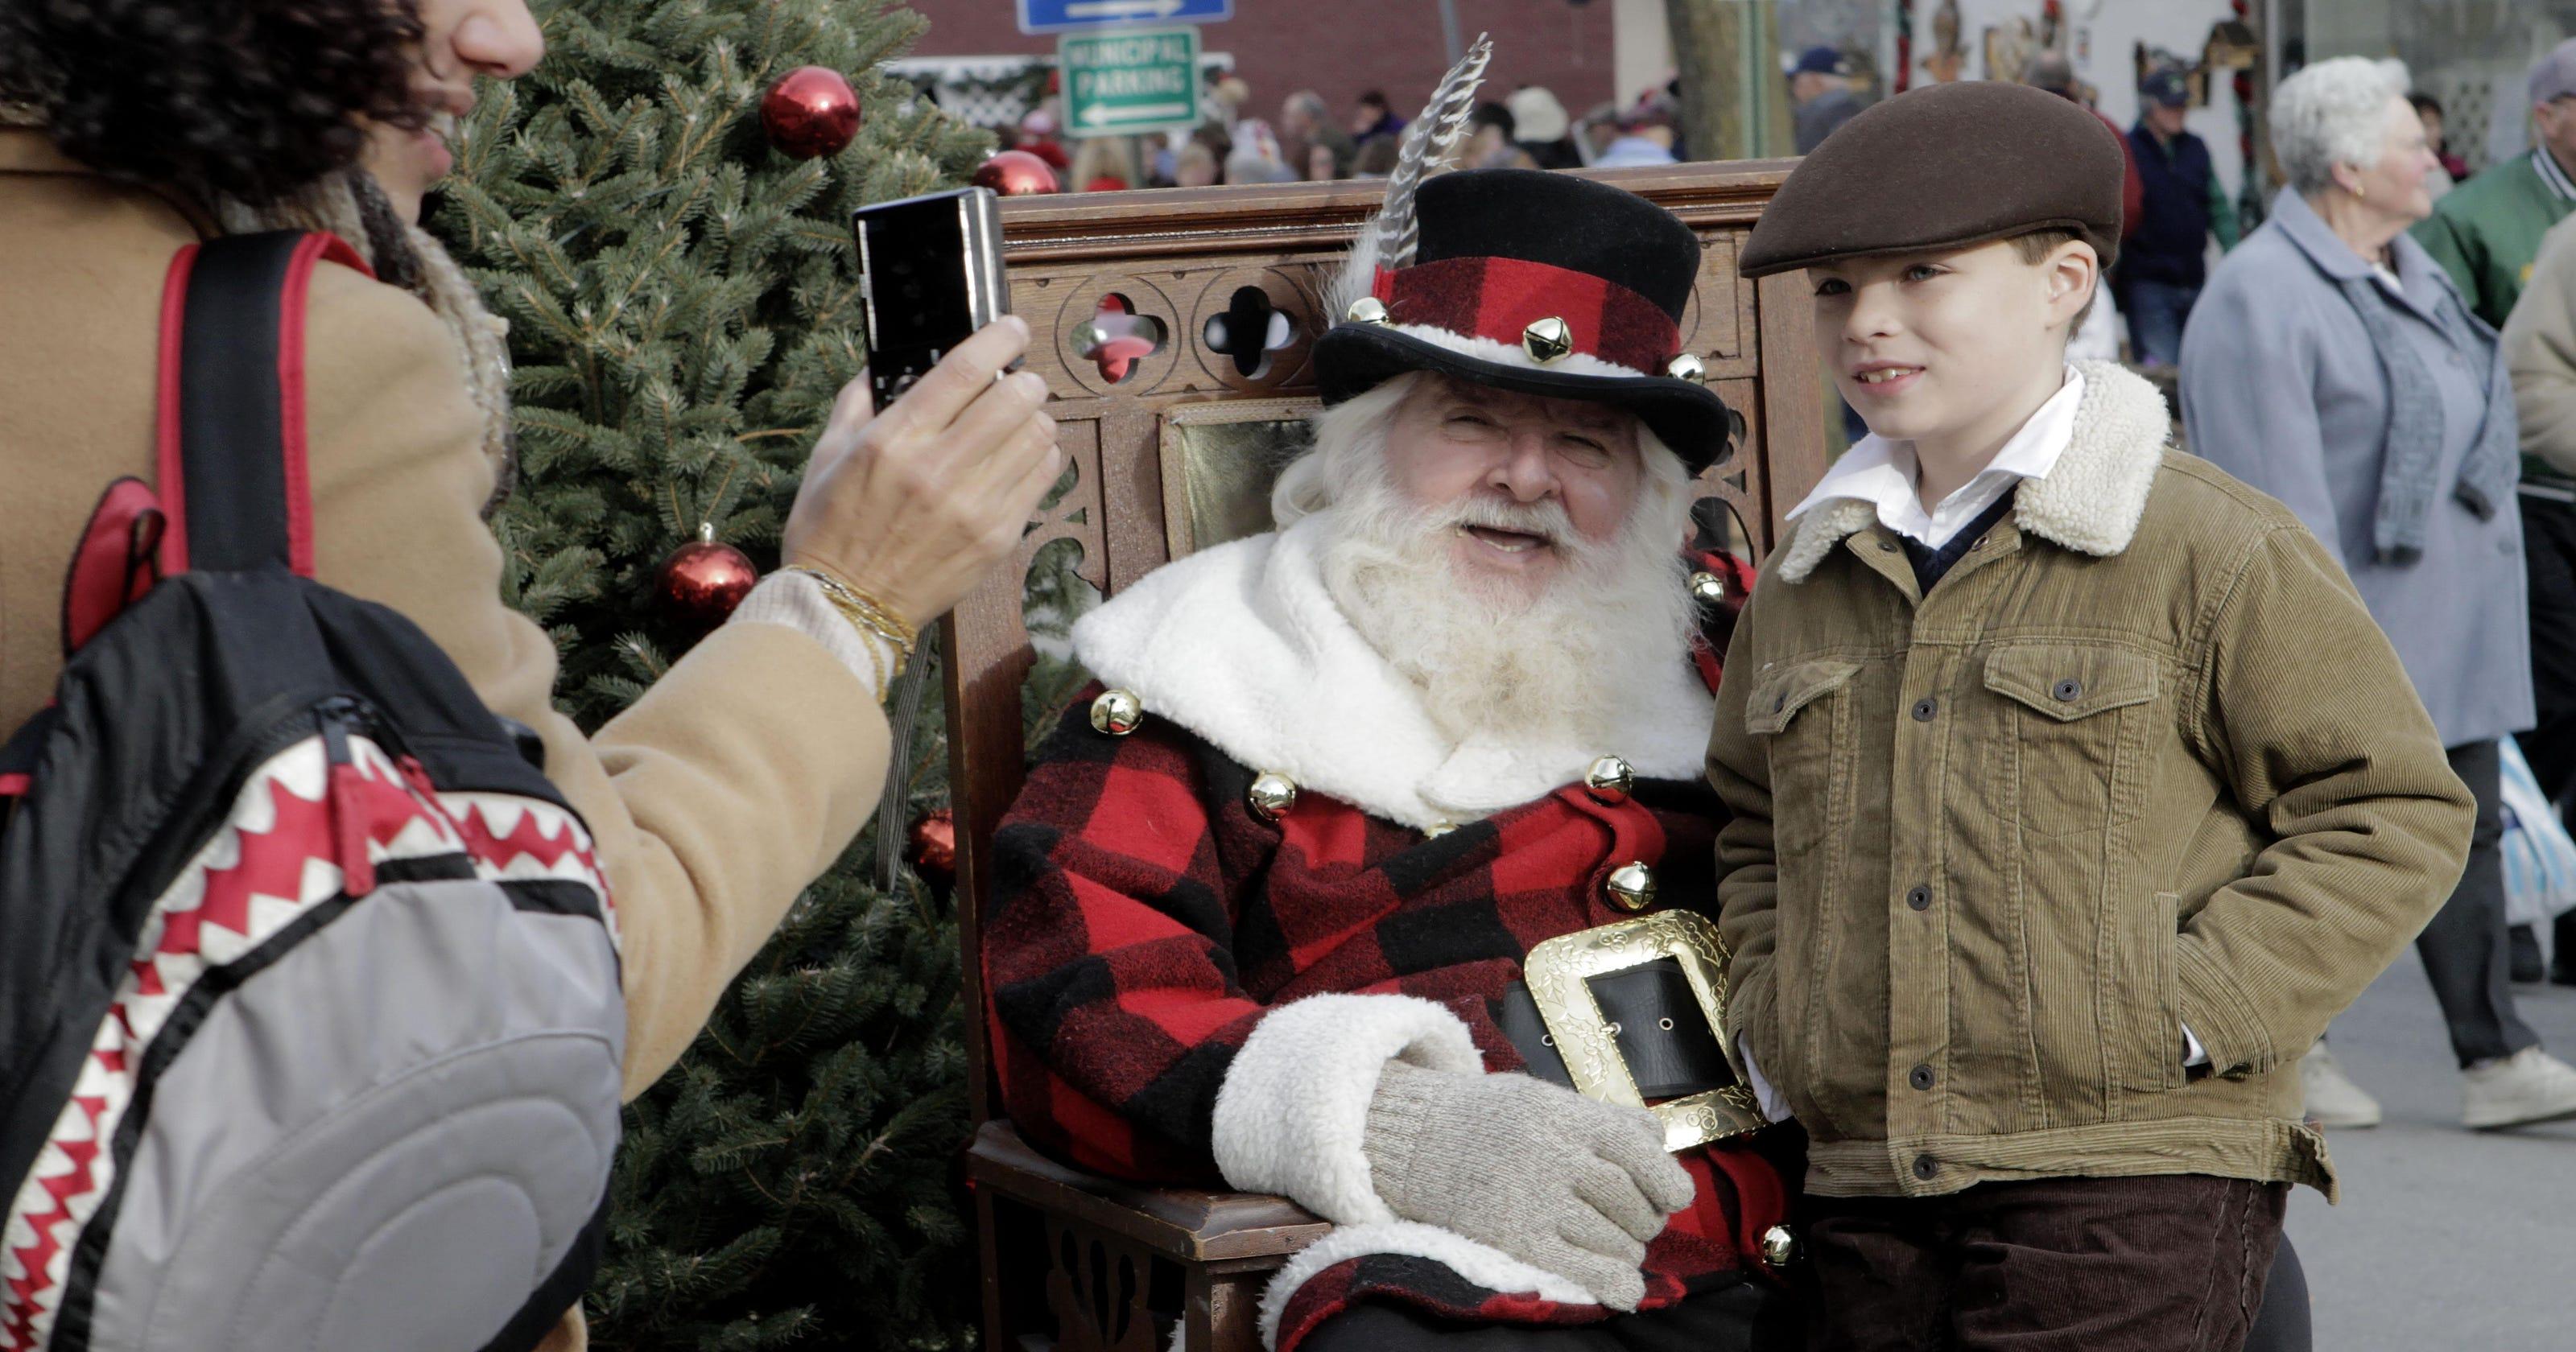 wellsboro decks the halls for dickens of a christmas